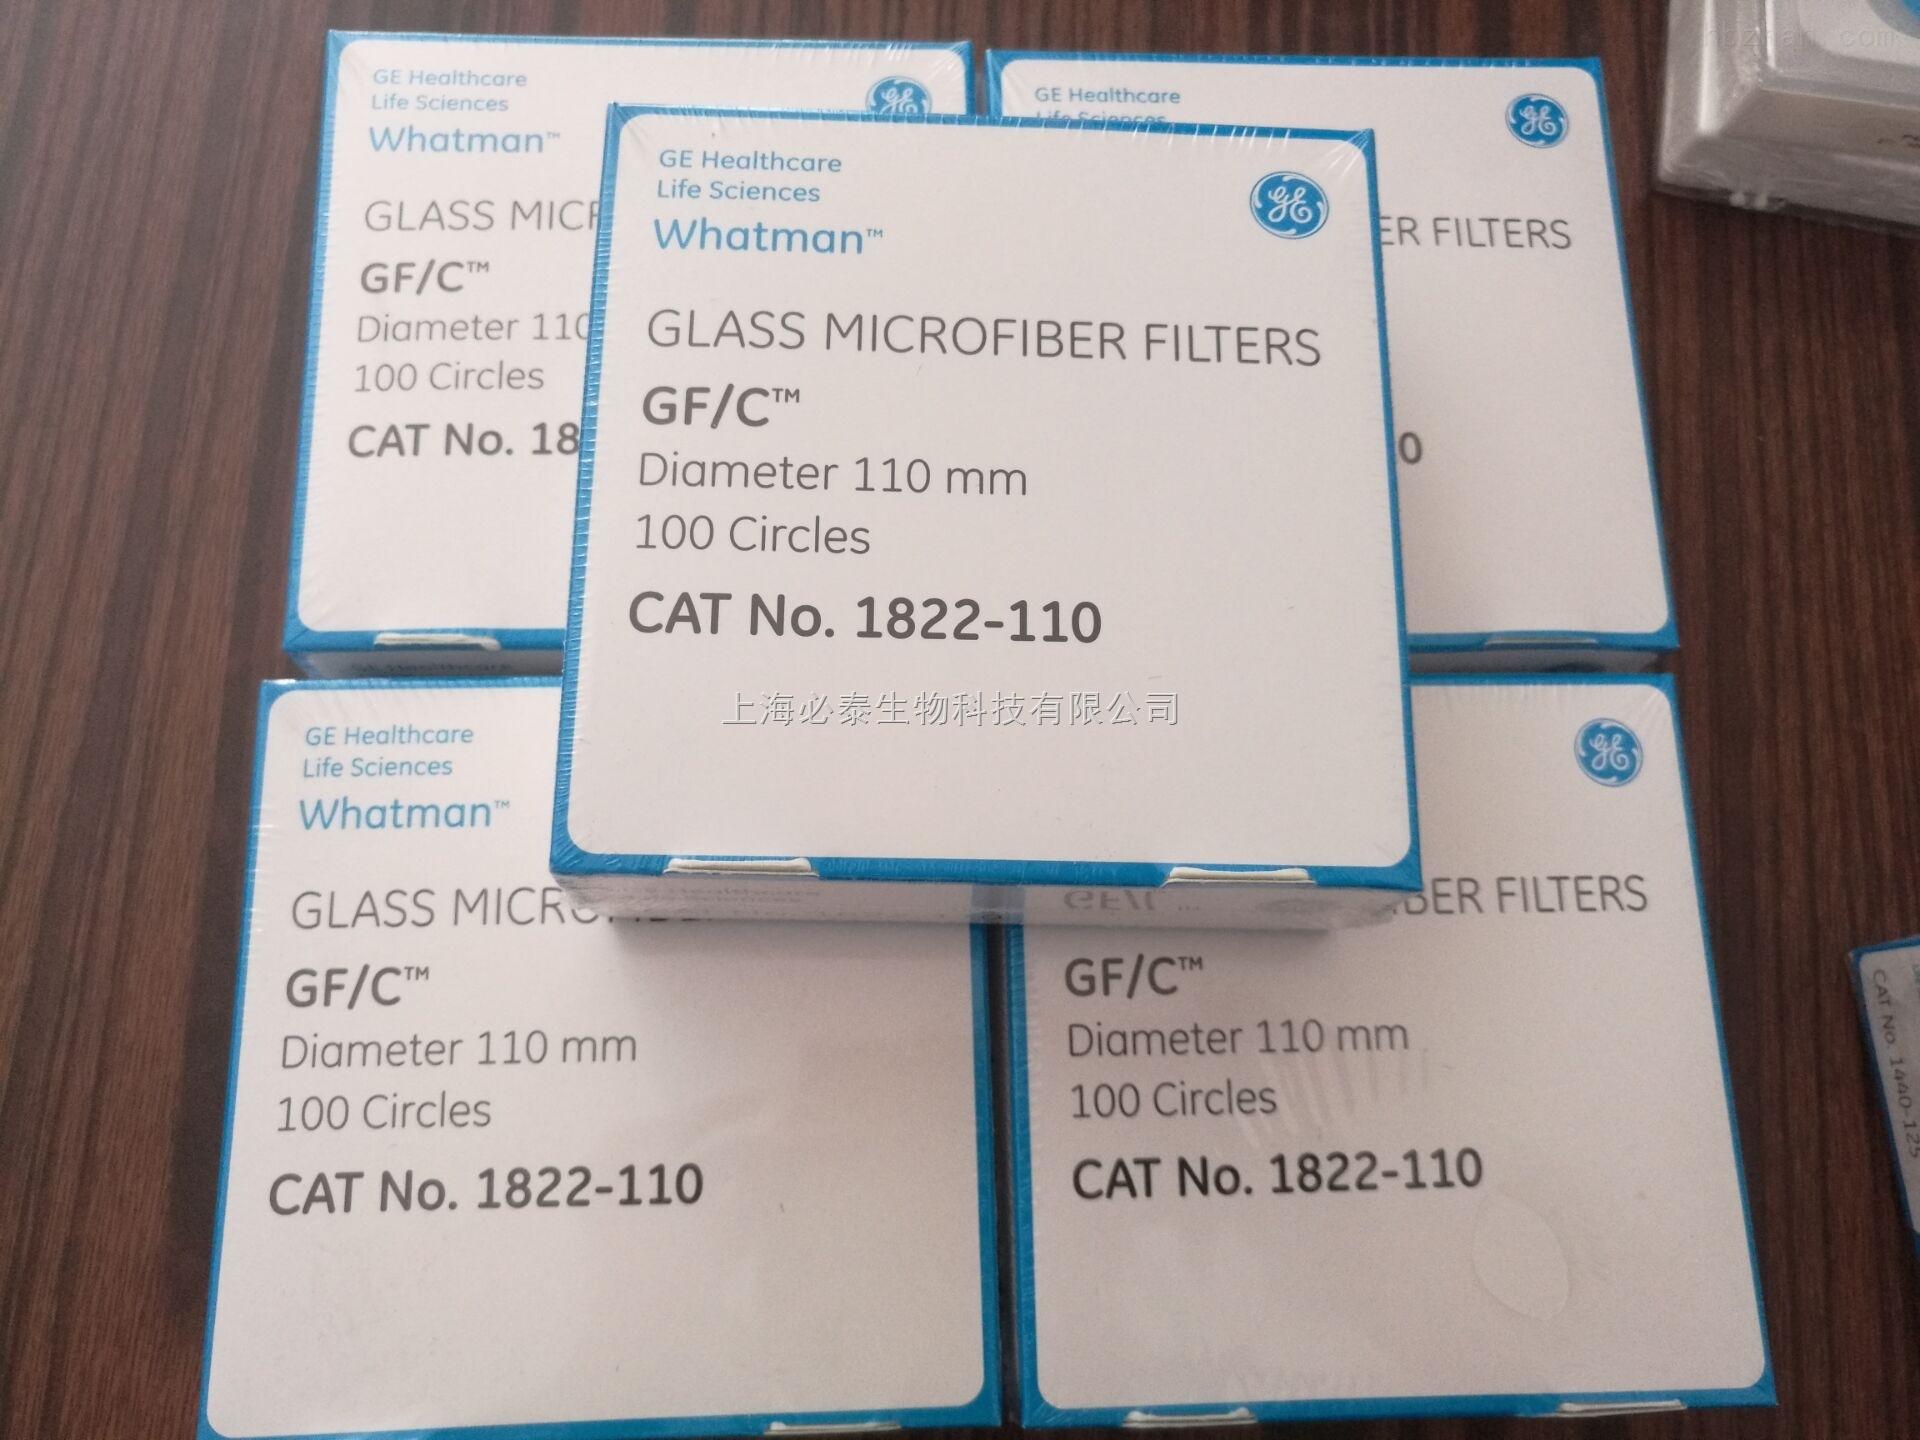 Whatman 沃特曼 无黏合剂玻璃微纤维滤纸 Grade GF/C